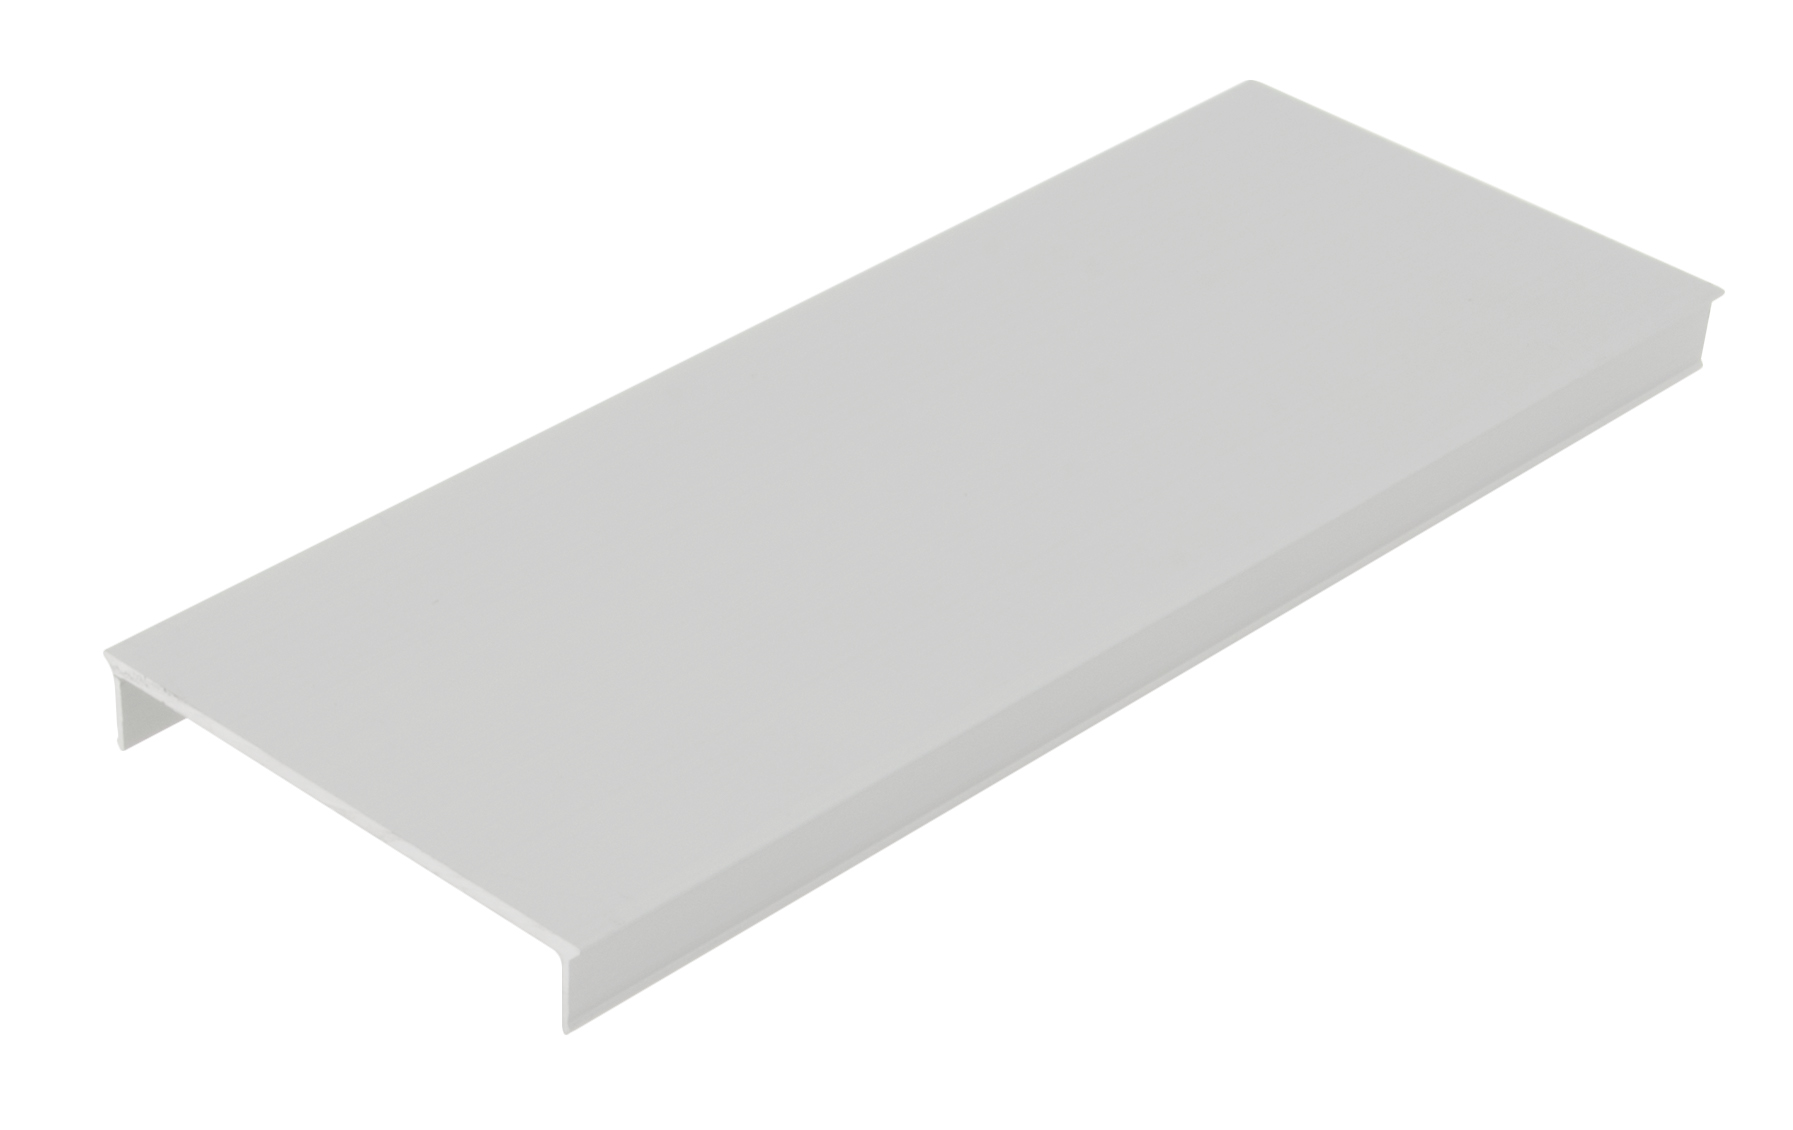 2 m Aluminiumabdeckung SL, L-2000mm B-58,3mm H-9,6mm LIAB003100